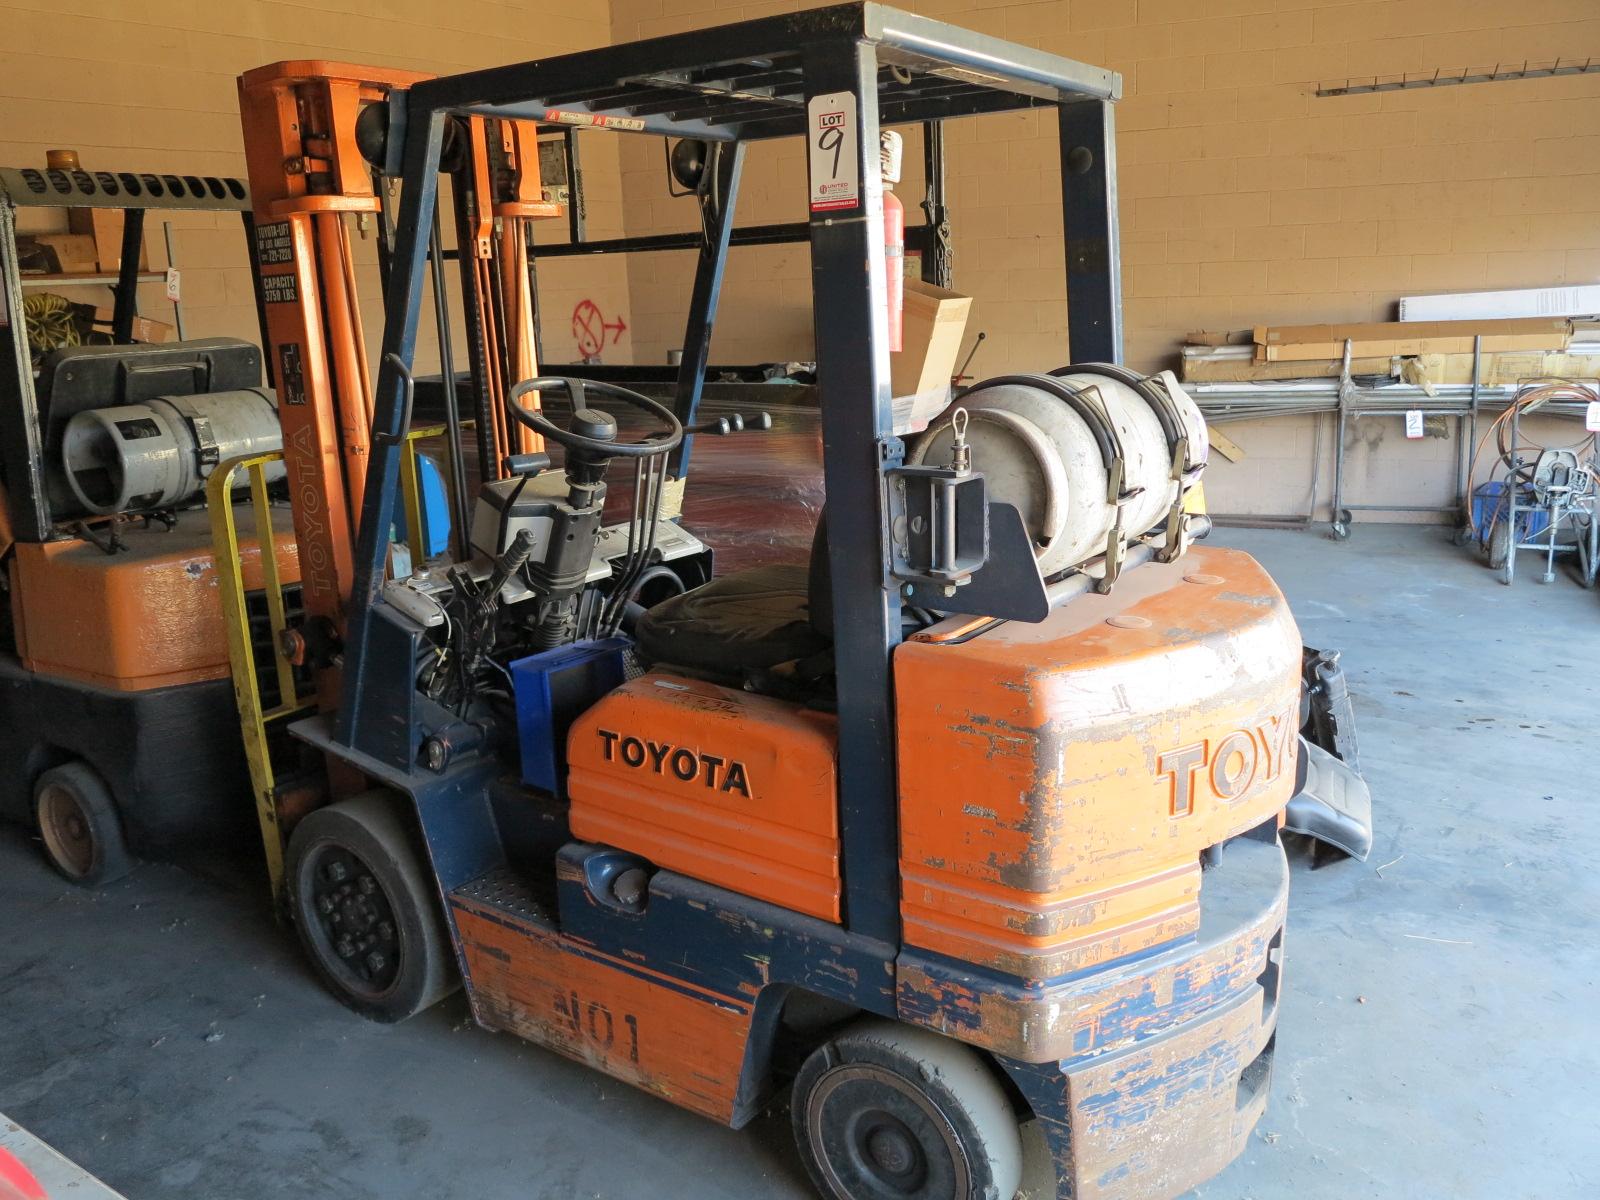 Lot 9 - TOYOTA 4,750 LB LP FORKLIFT, MODEL 5FGC25, S/N 73125, OUT OF SERVICE